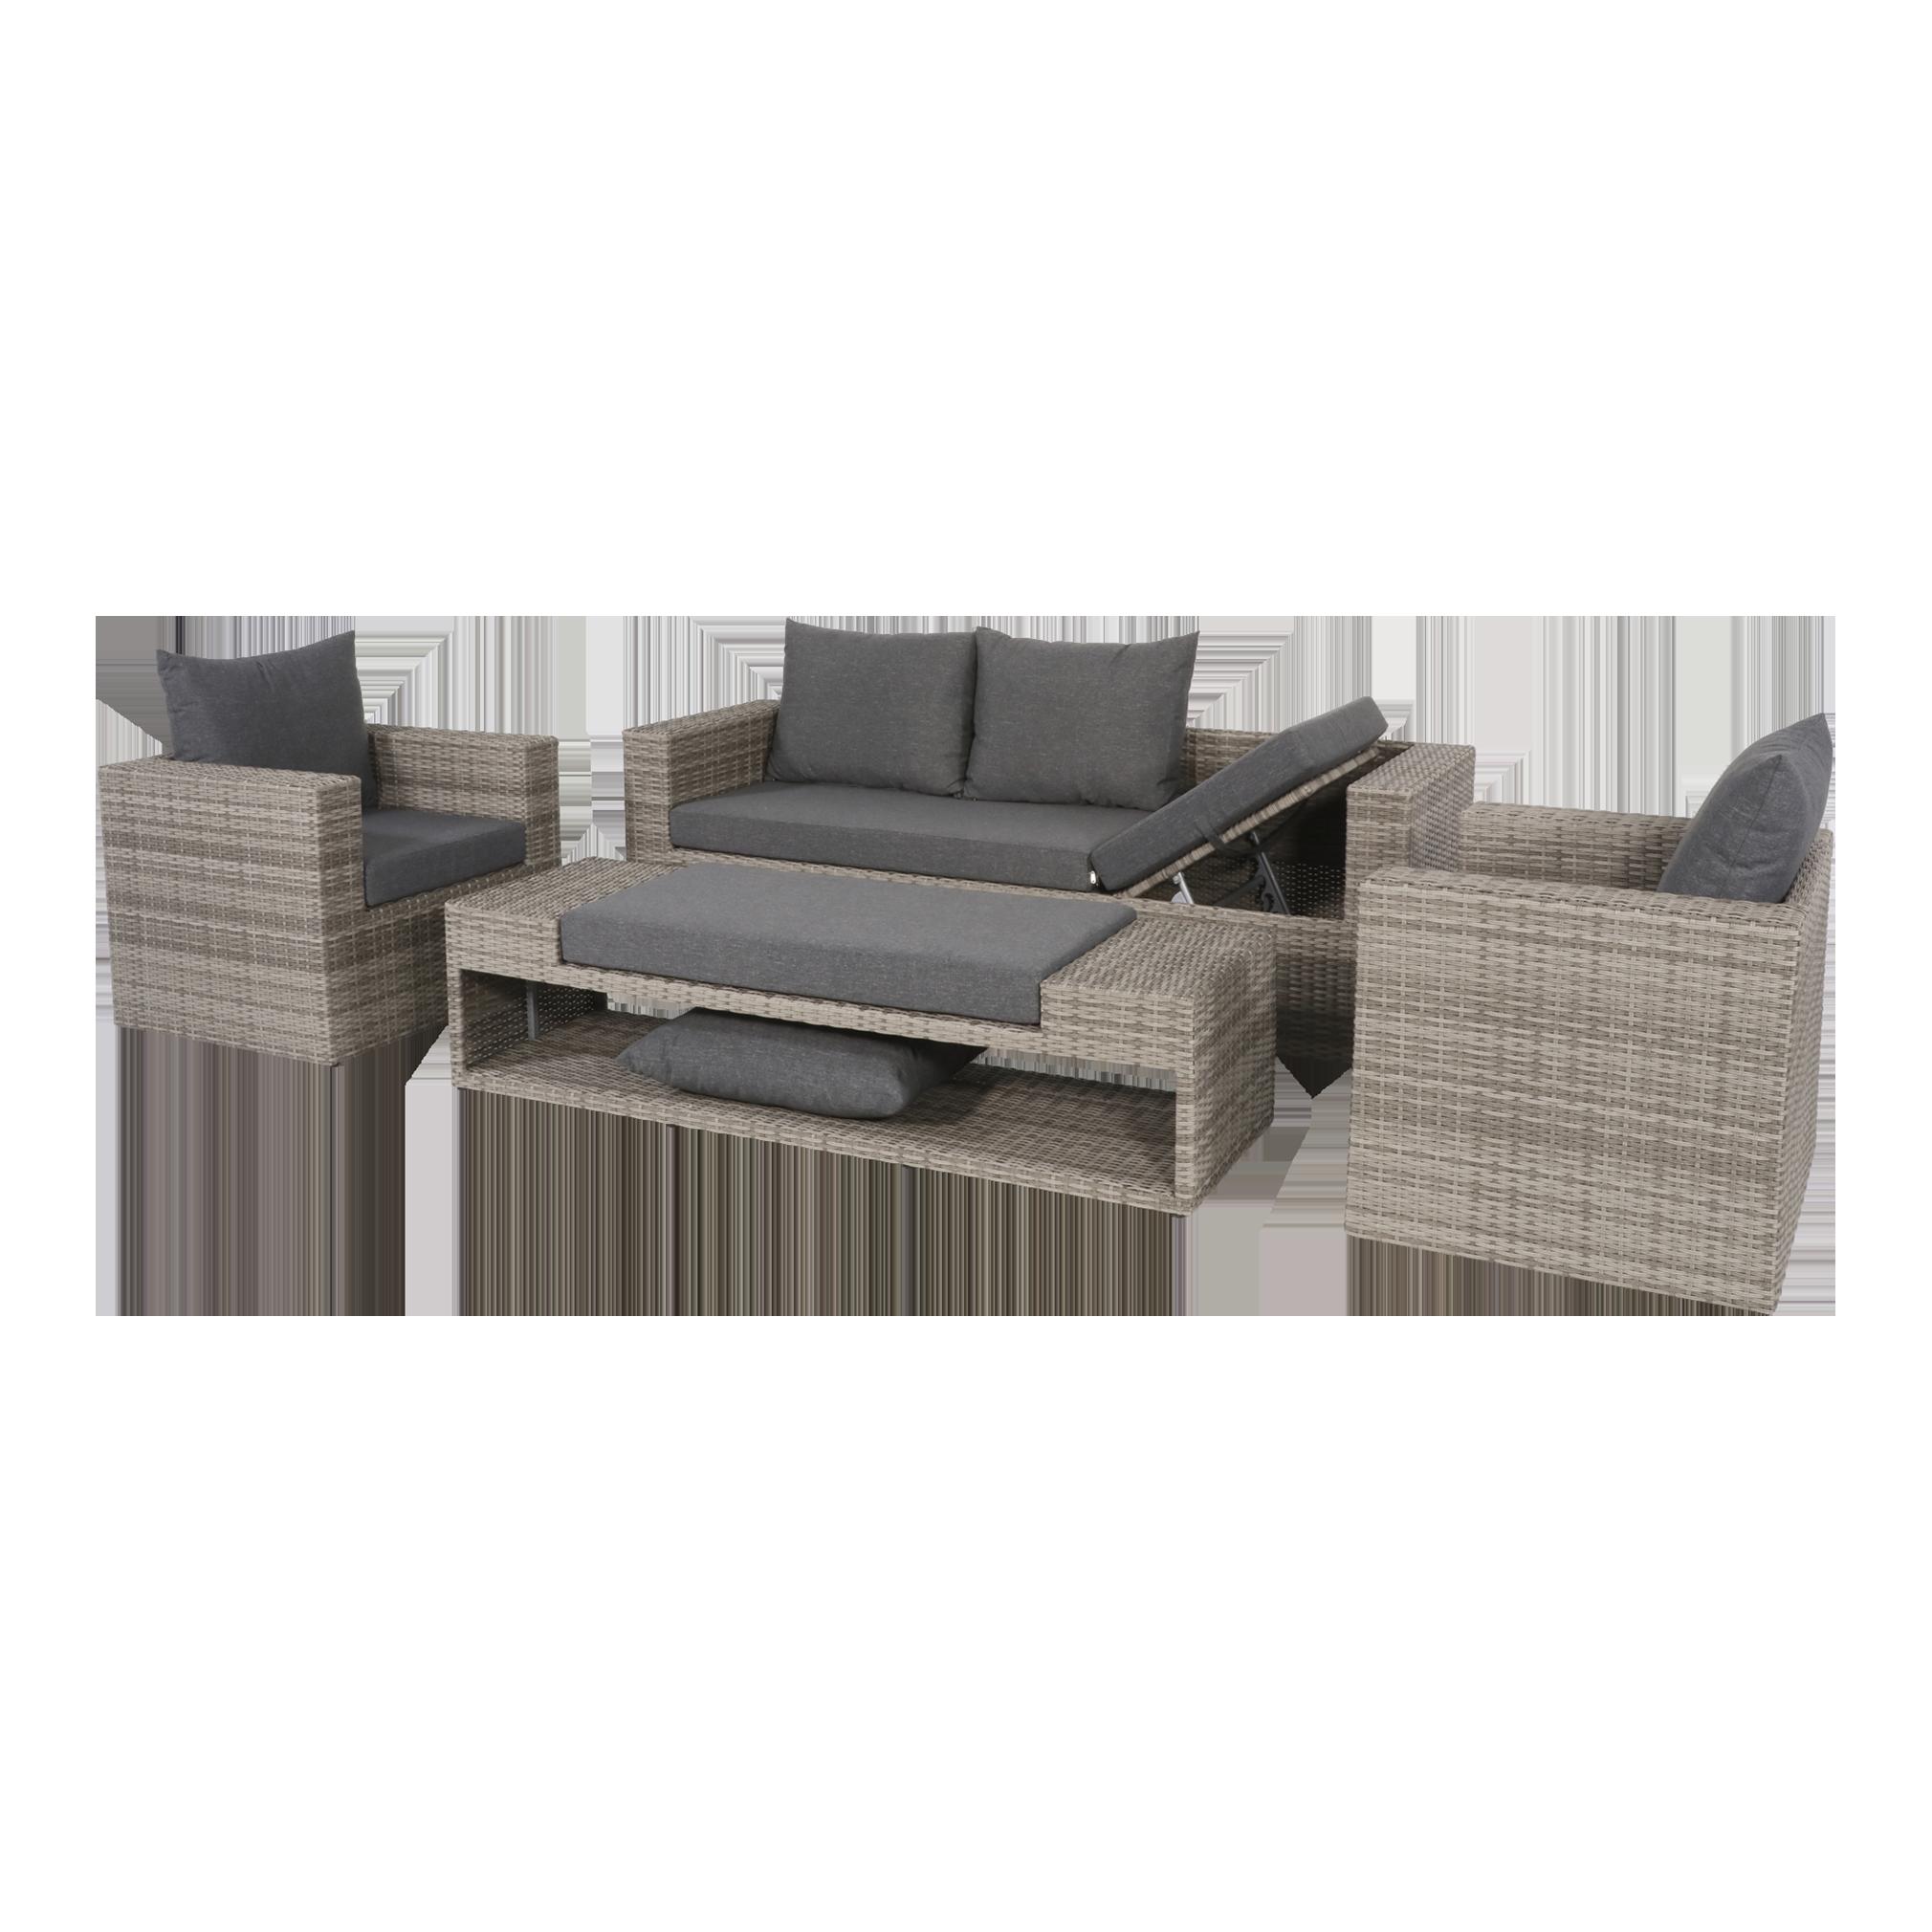 Loungeset Gartenmöbel Set Lounge Roma 4teilig grau hochwertig | eBay